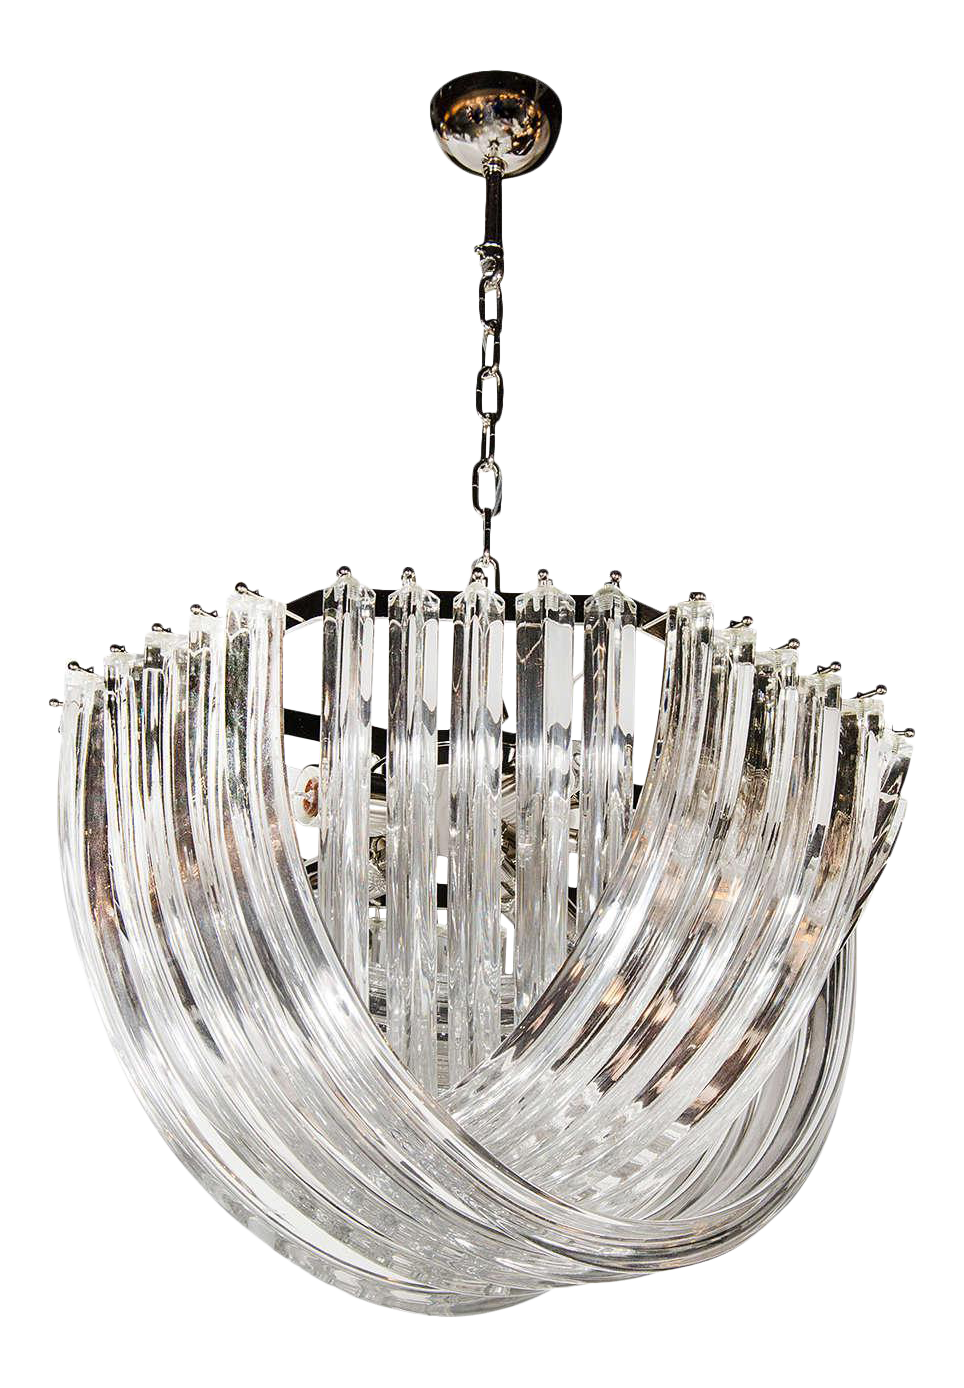 chandelier antiques lucite ribbon com vintage miami worthgalleries